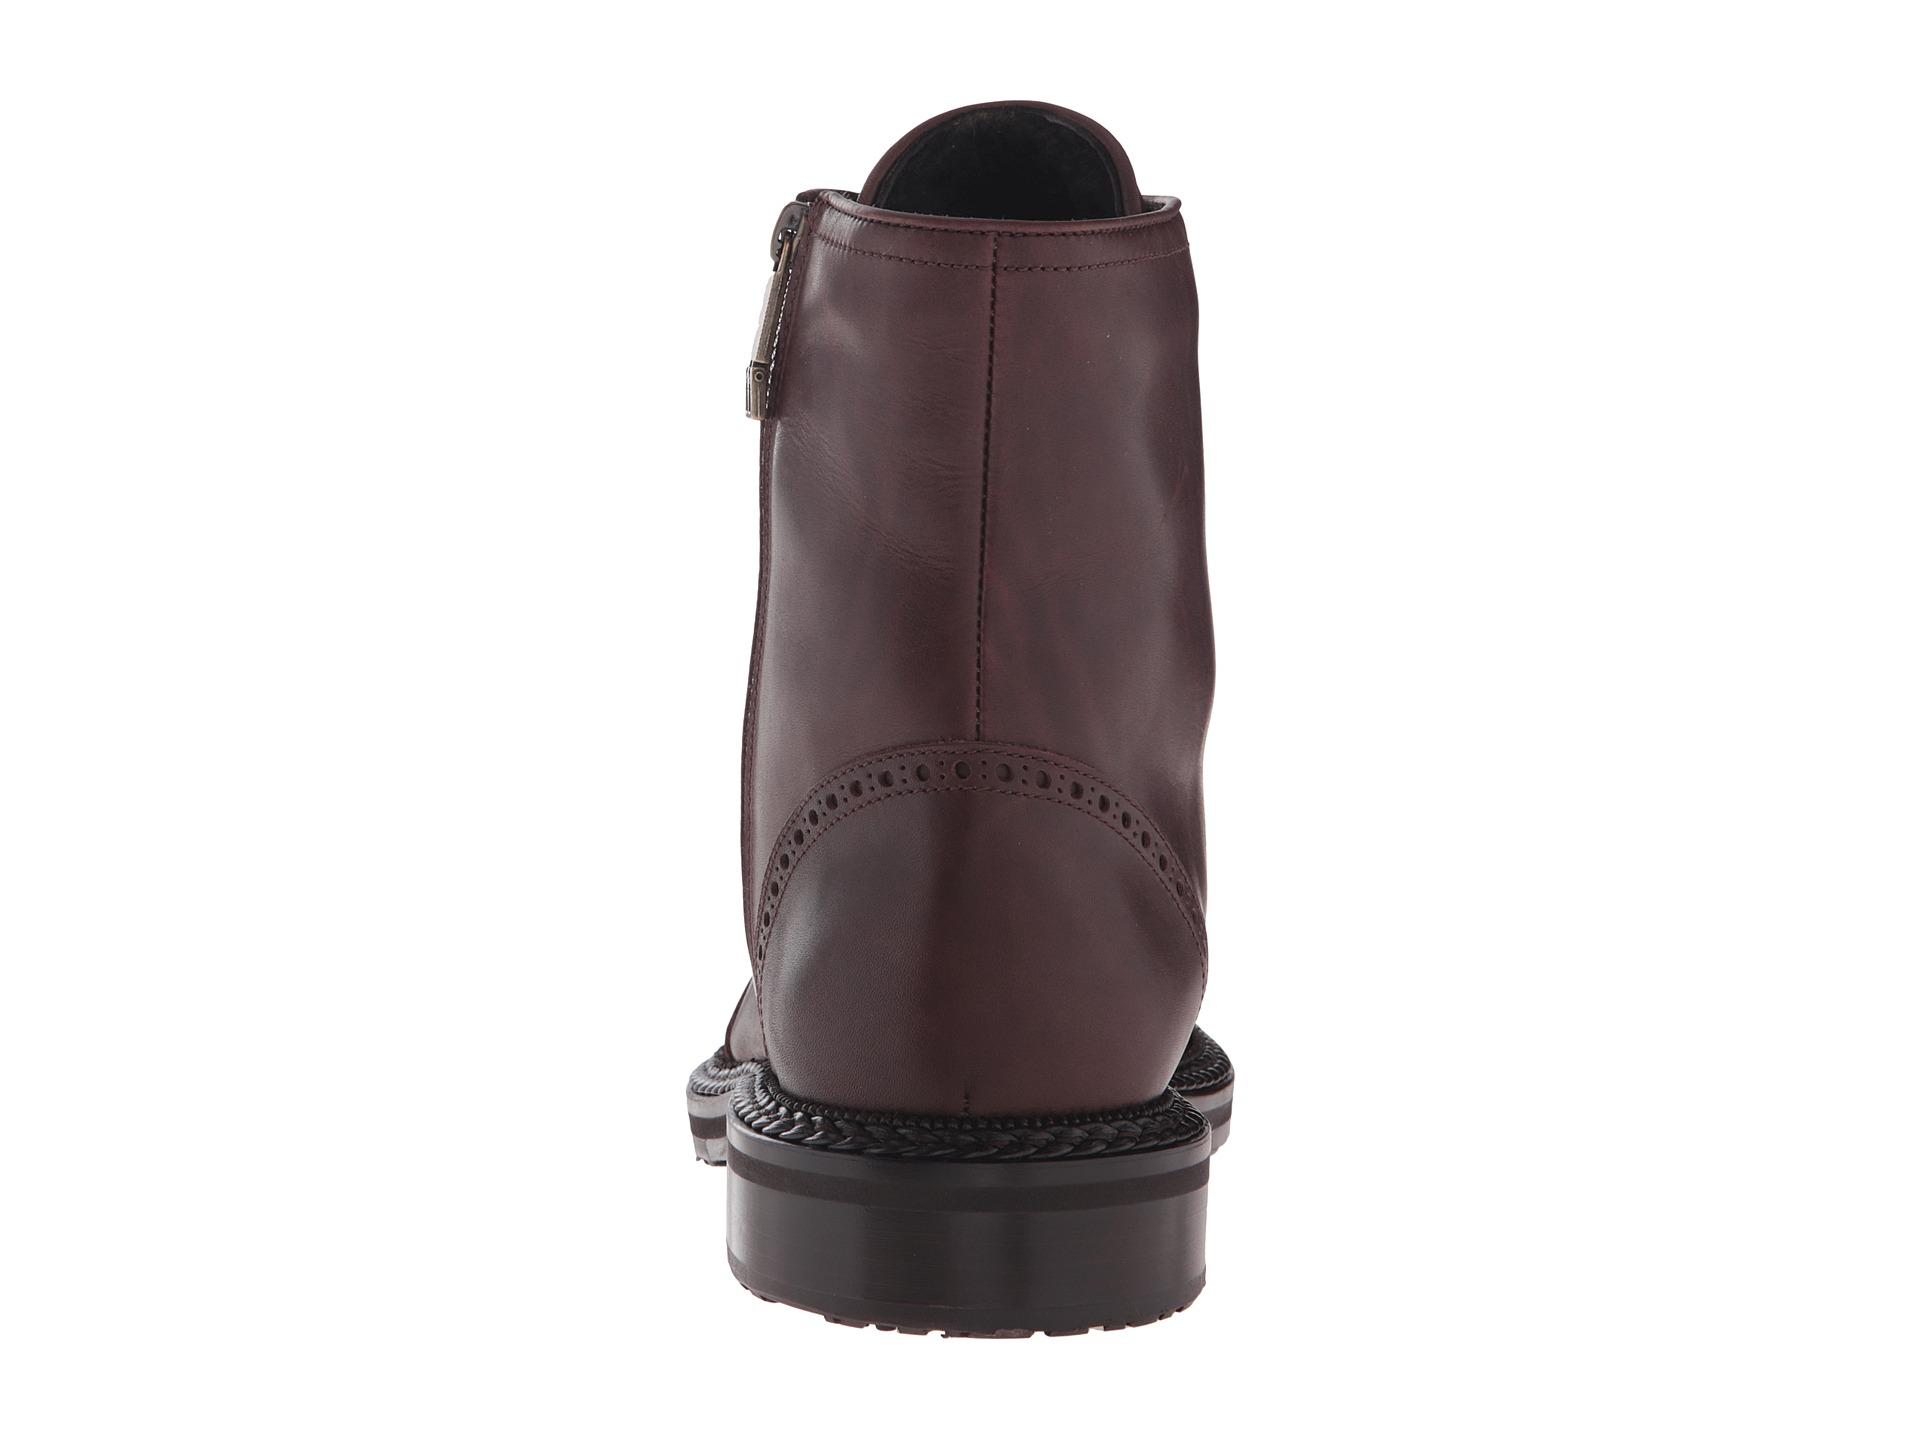 etro barolo boot brown zappos free shipping both ways